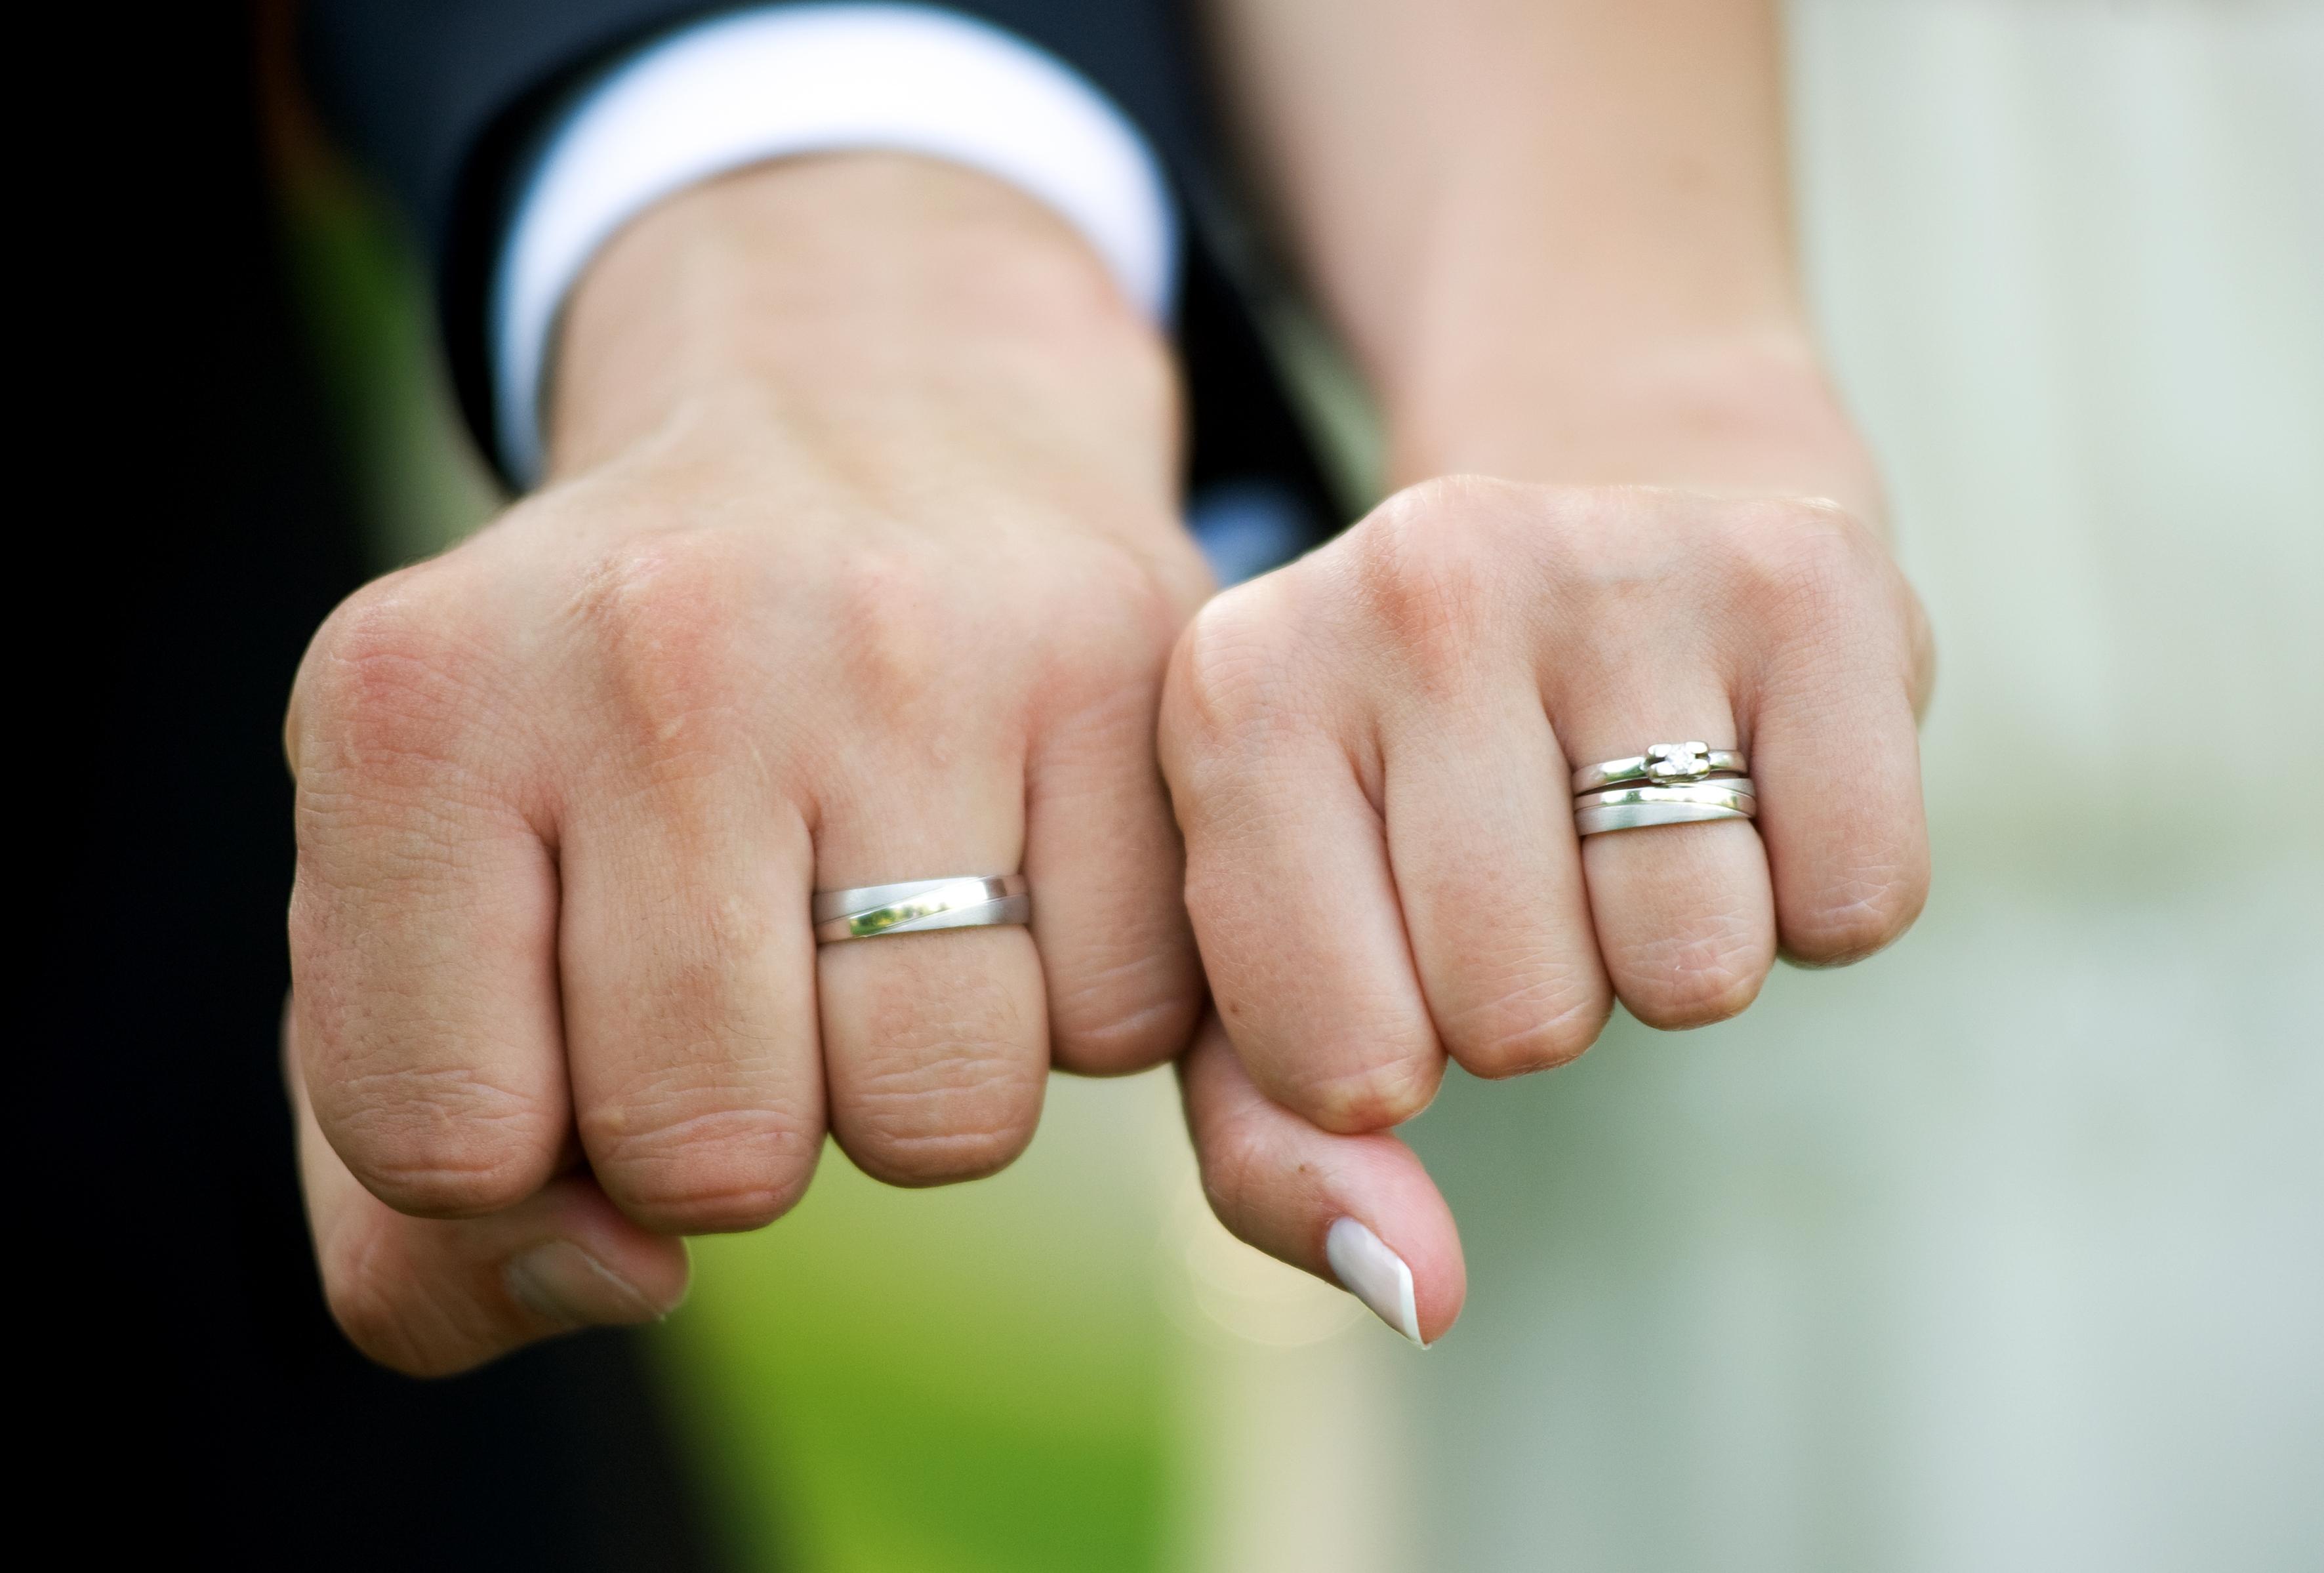 THROWBACK TO MY WEDDING DAY FROM PARIS TO LJUBLJANA by Gagi